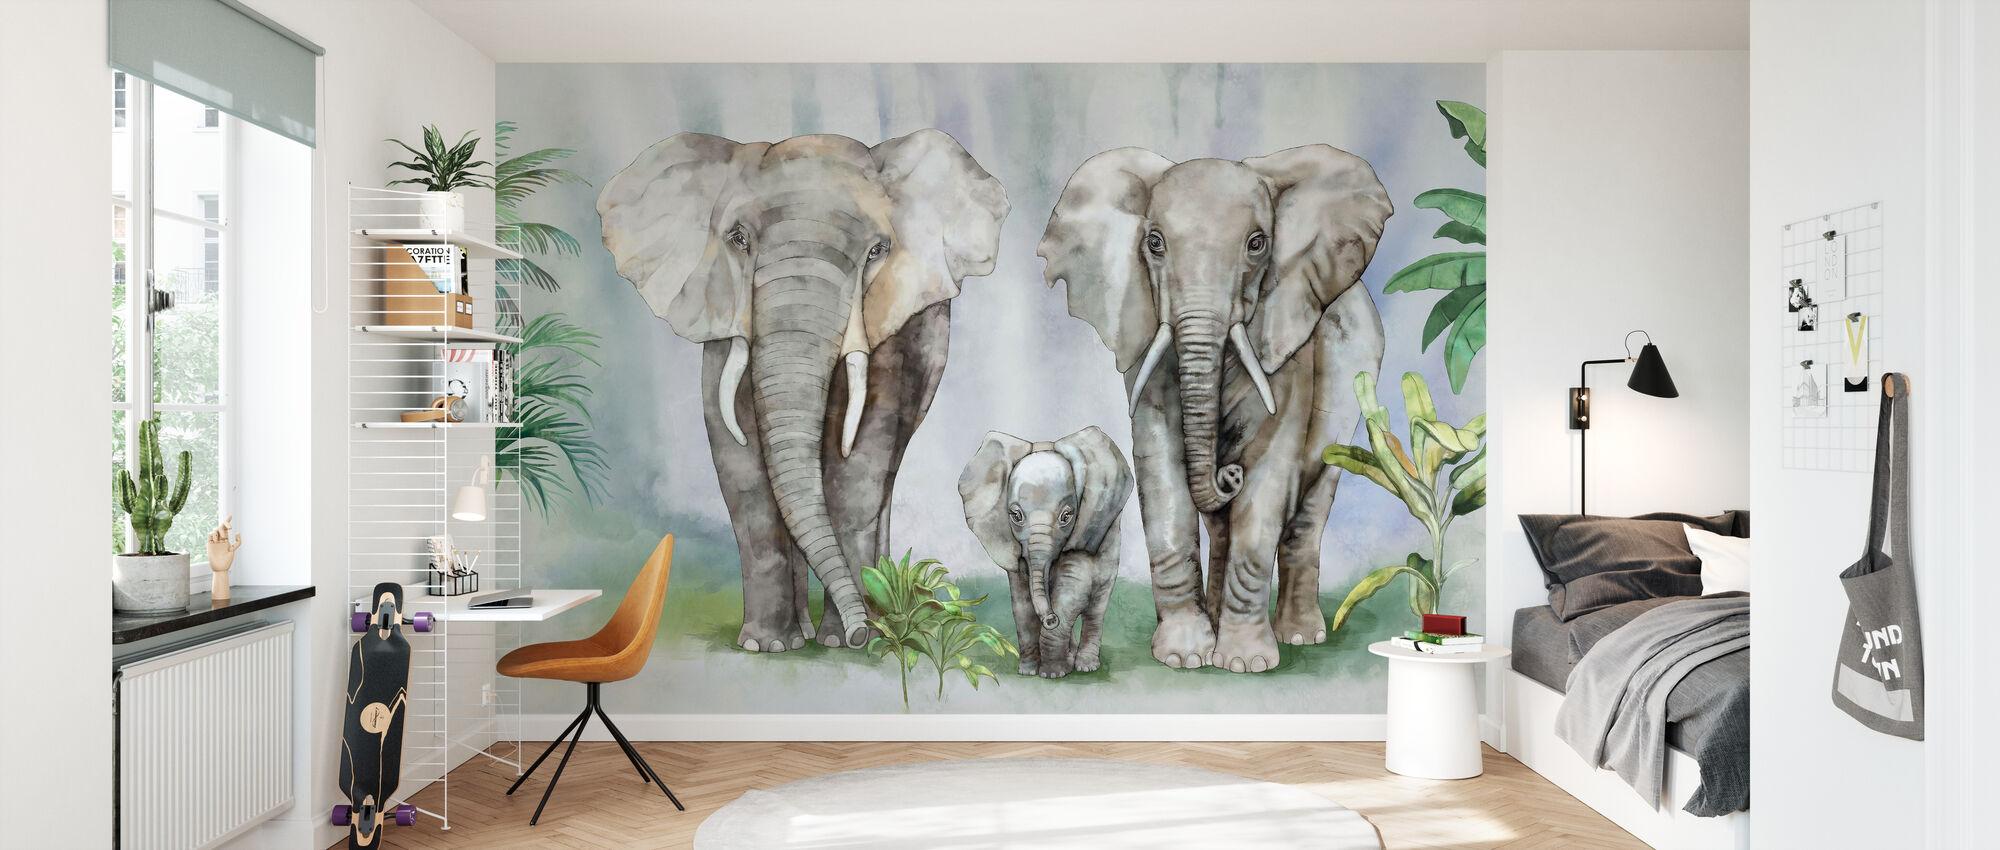 Elephant Family Ii Trendy Wall Mural Photowall